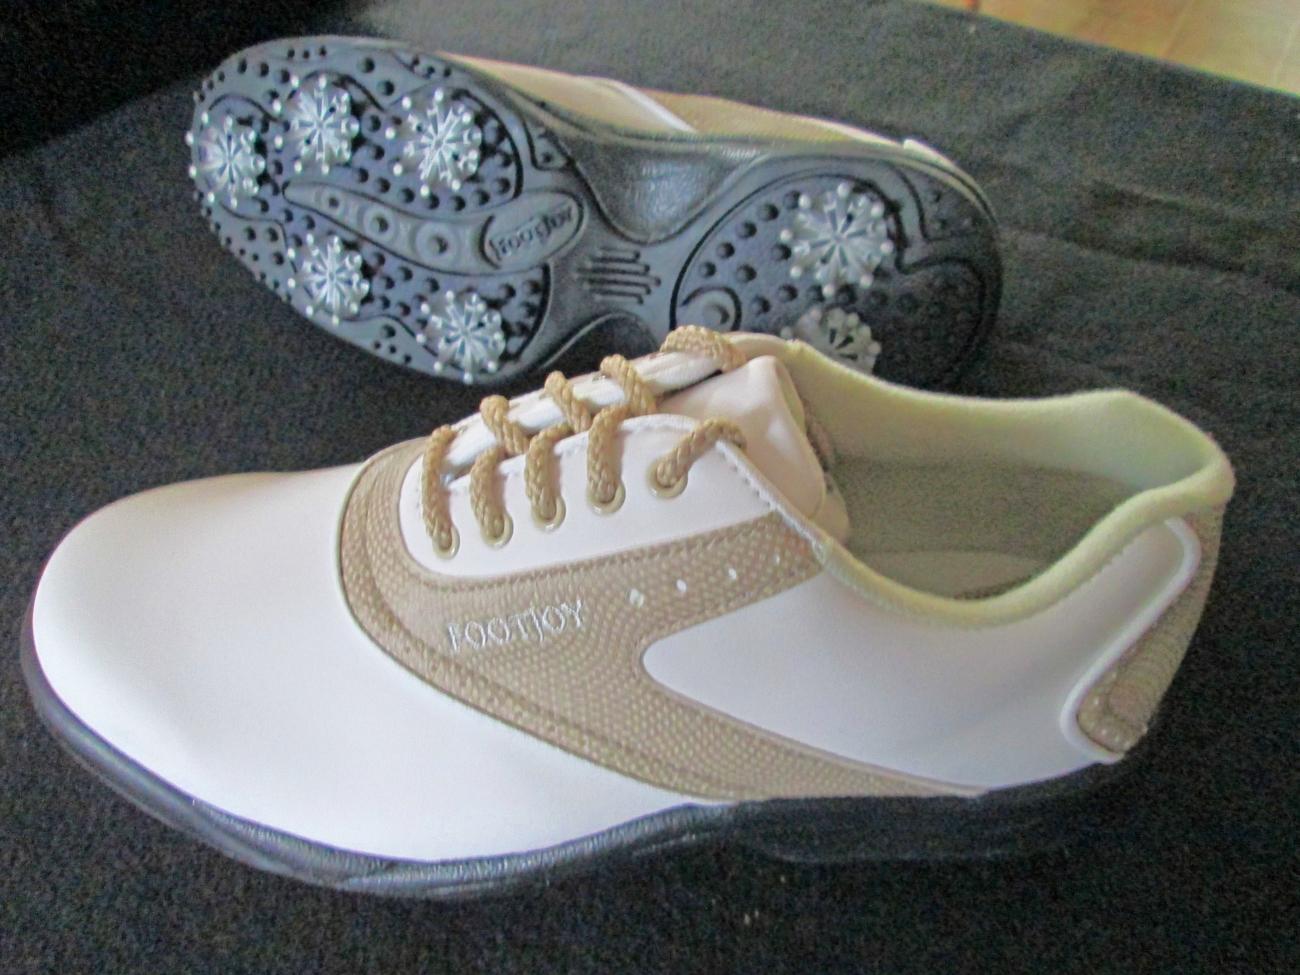 Footjoy Women's Golf Shoes Size 7 Medium NIB